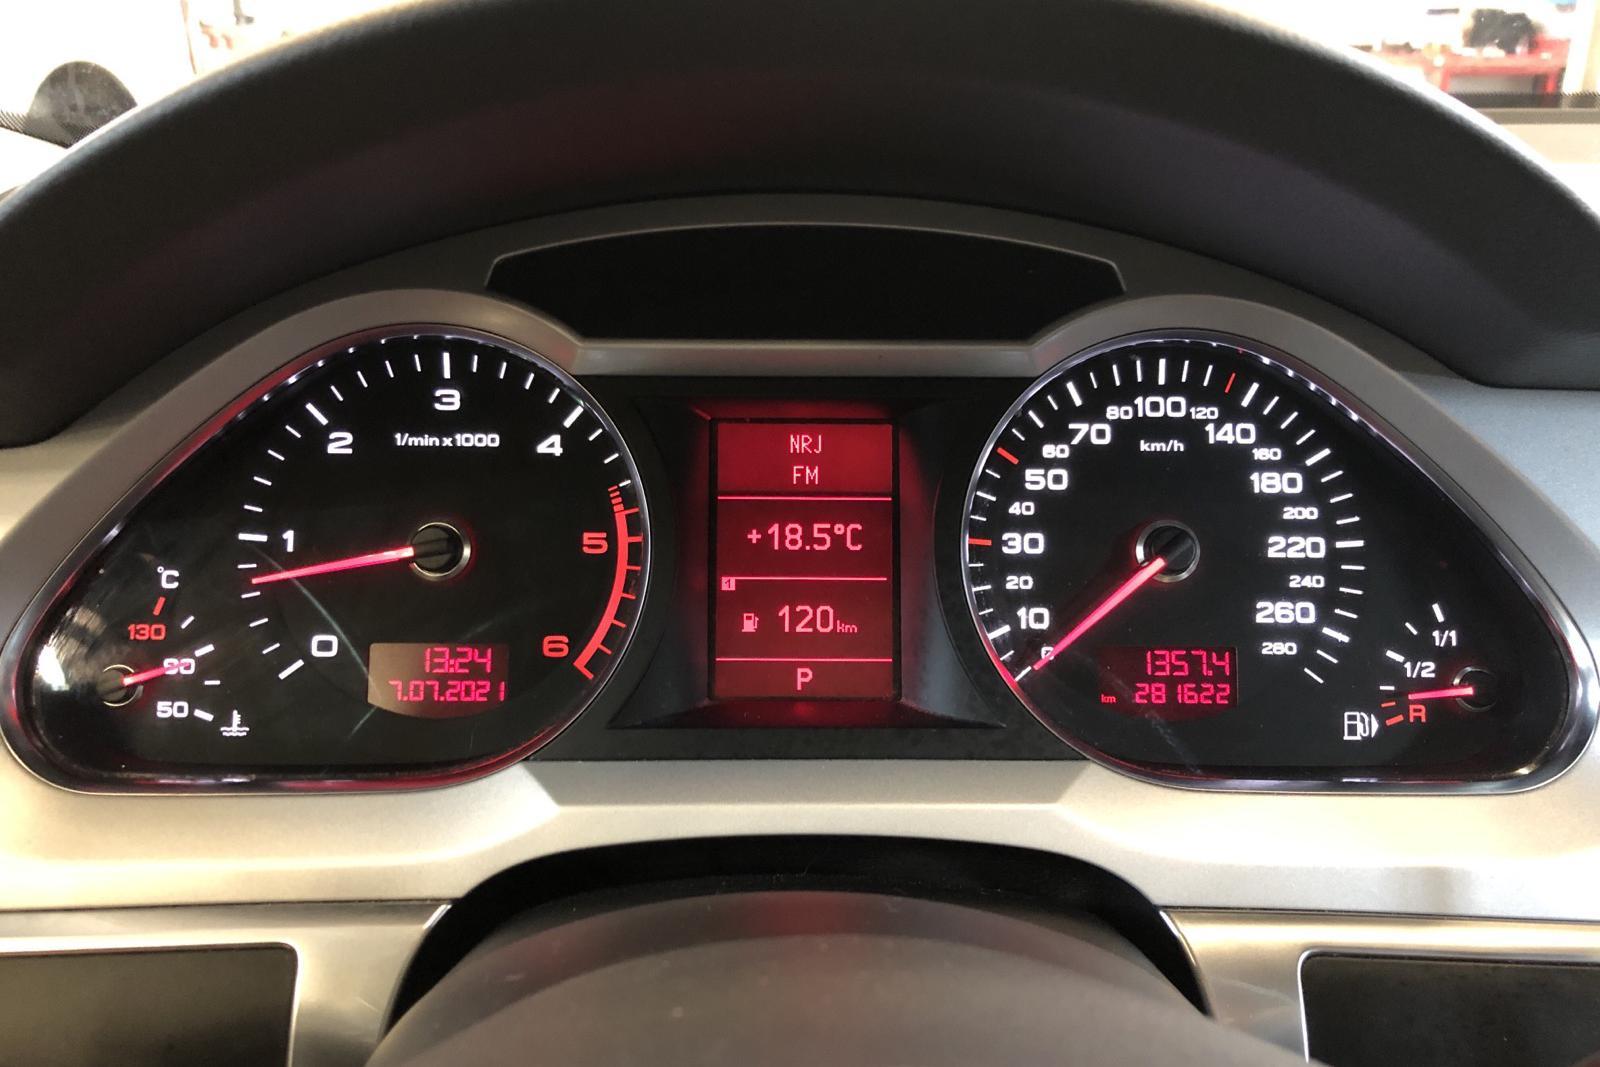 Audi A6 3.0 TDI Avant quattro (240hk) - 281 620 km - Automatic - gray - 2011